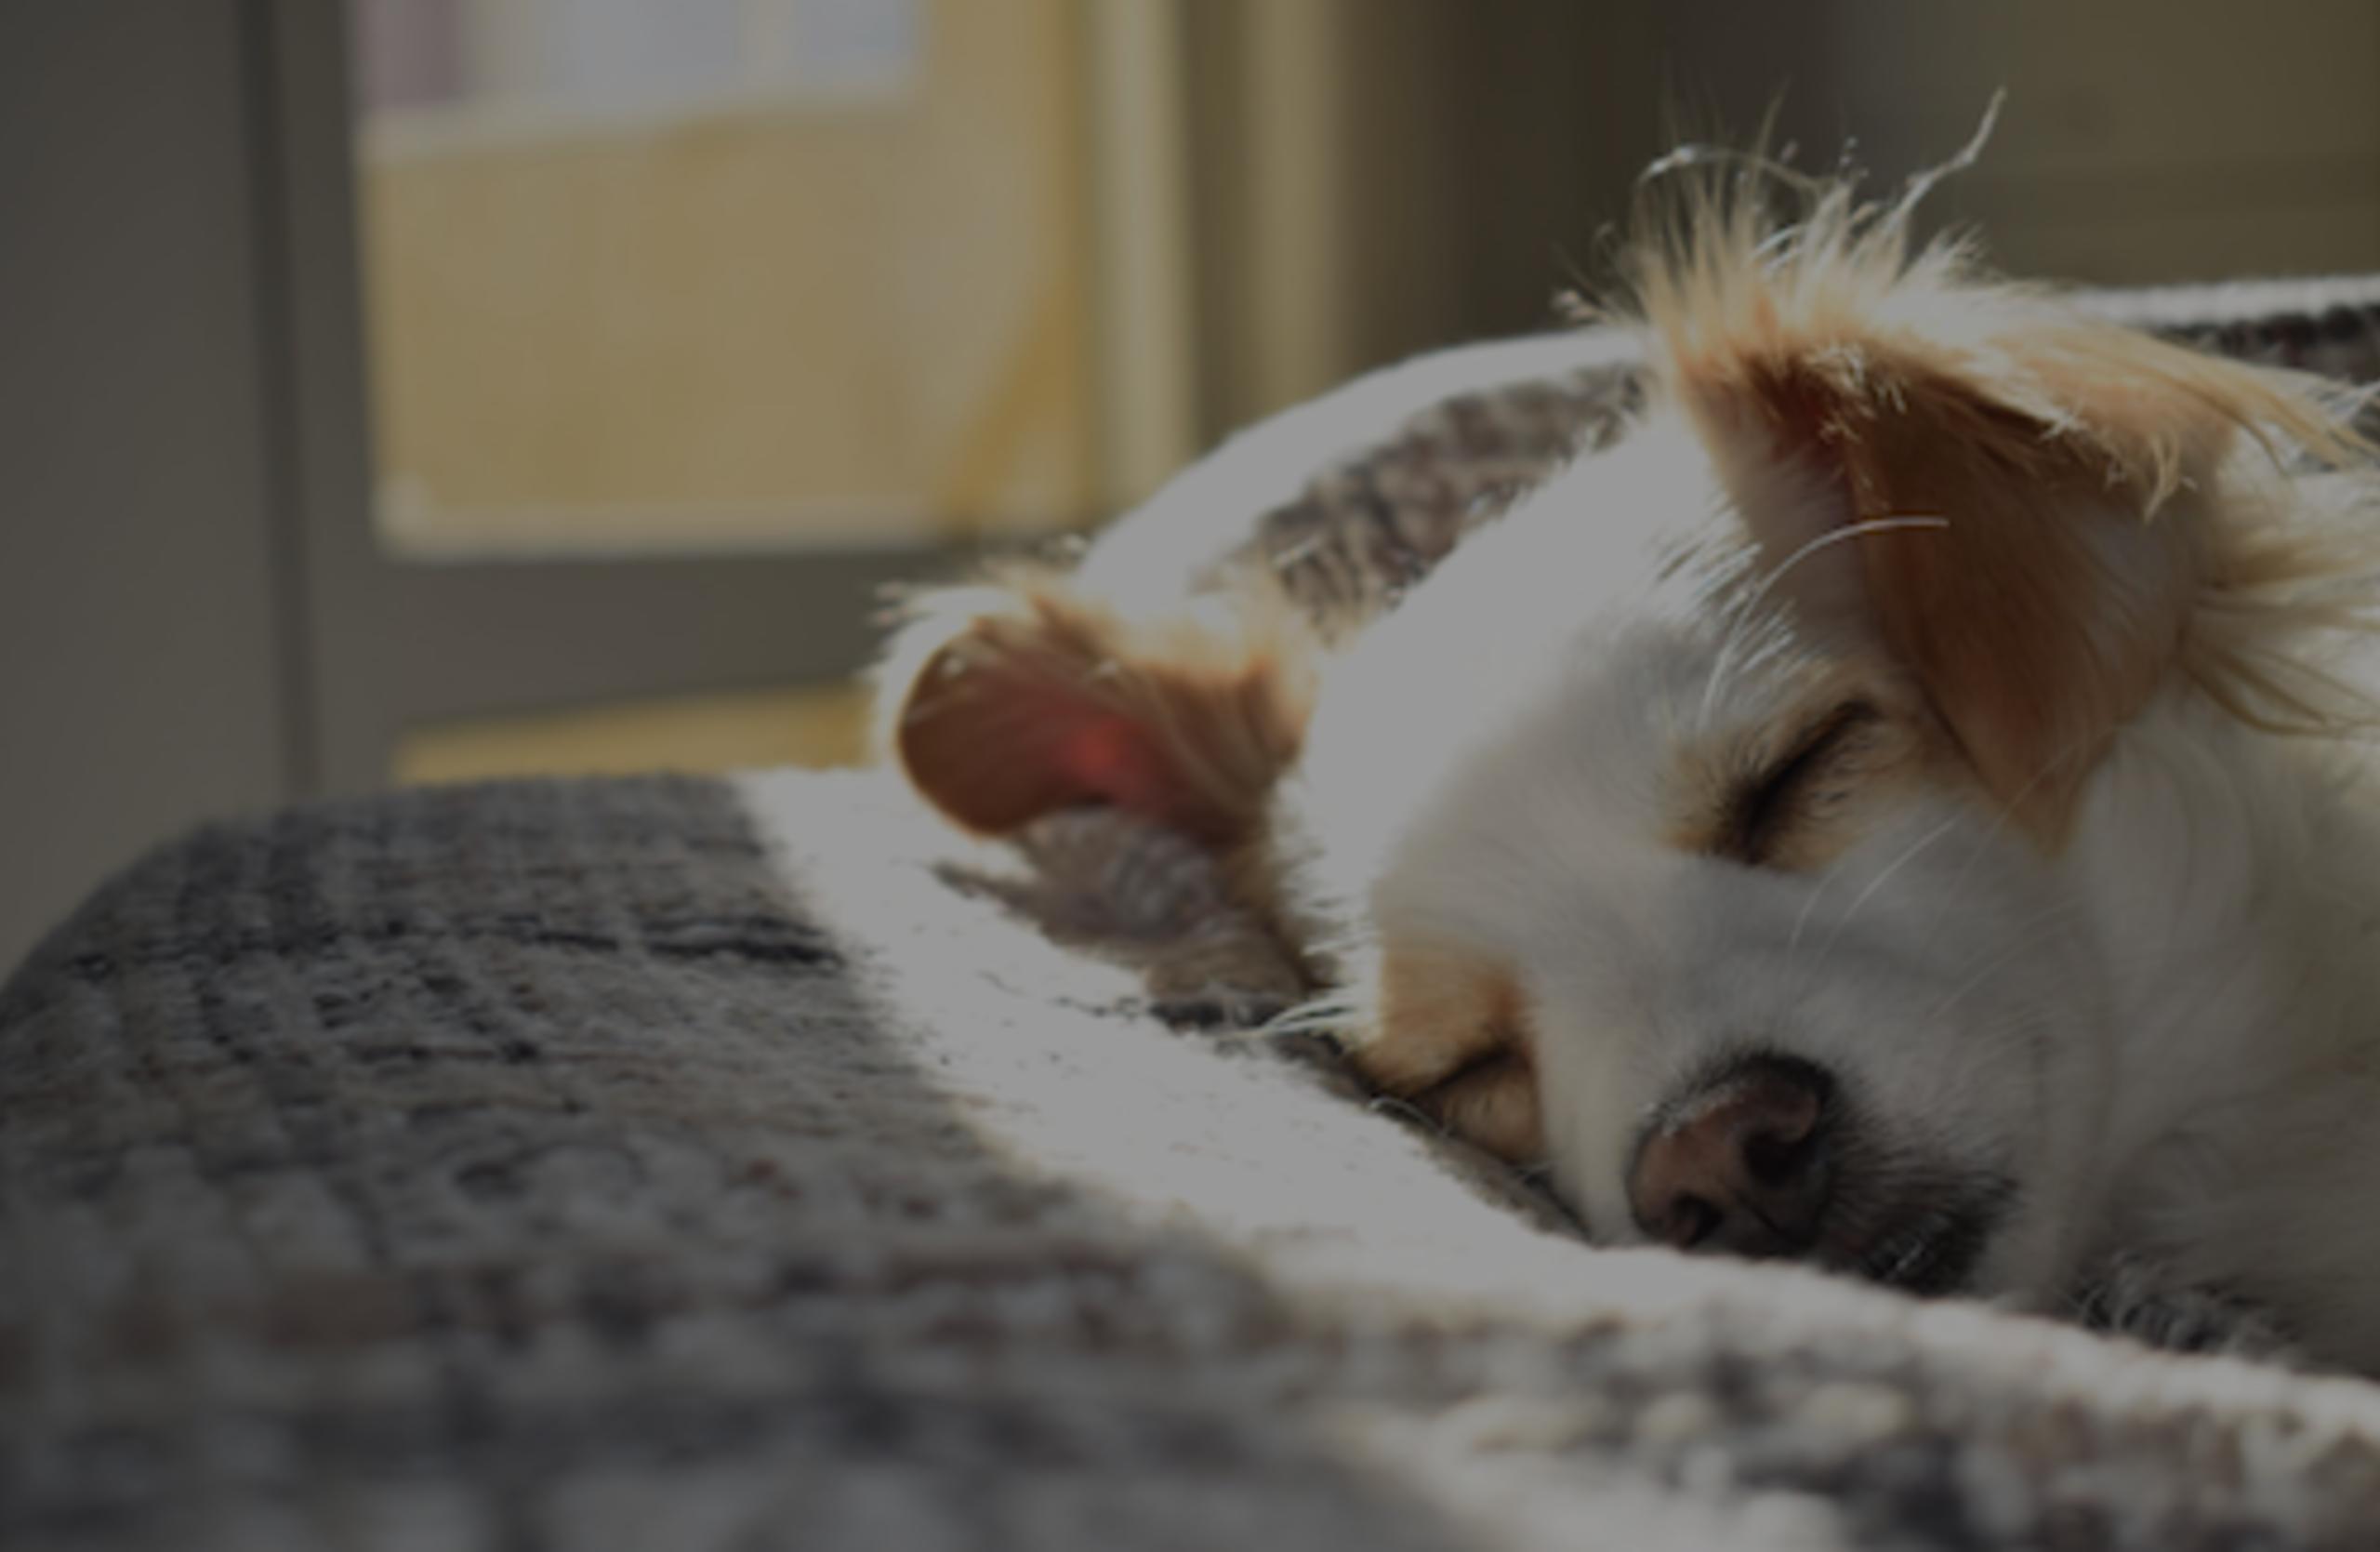 12 Pet Owner Maintenance Musts